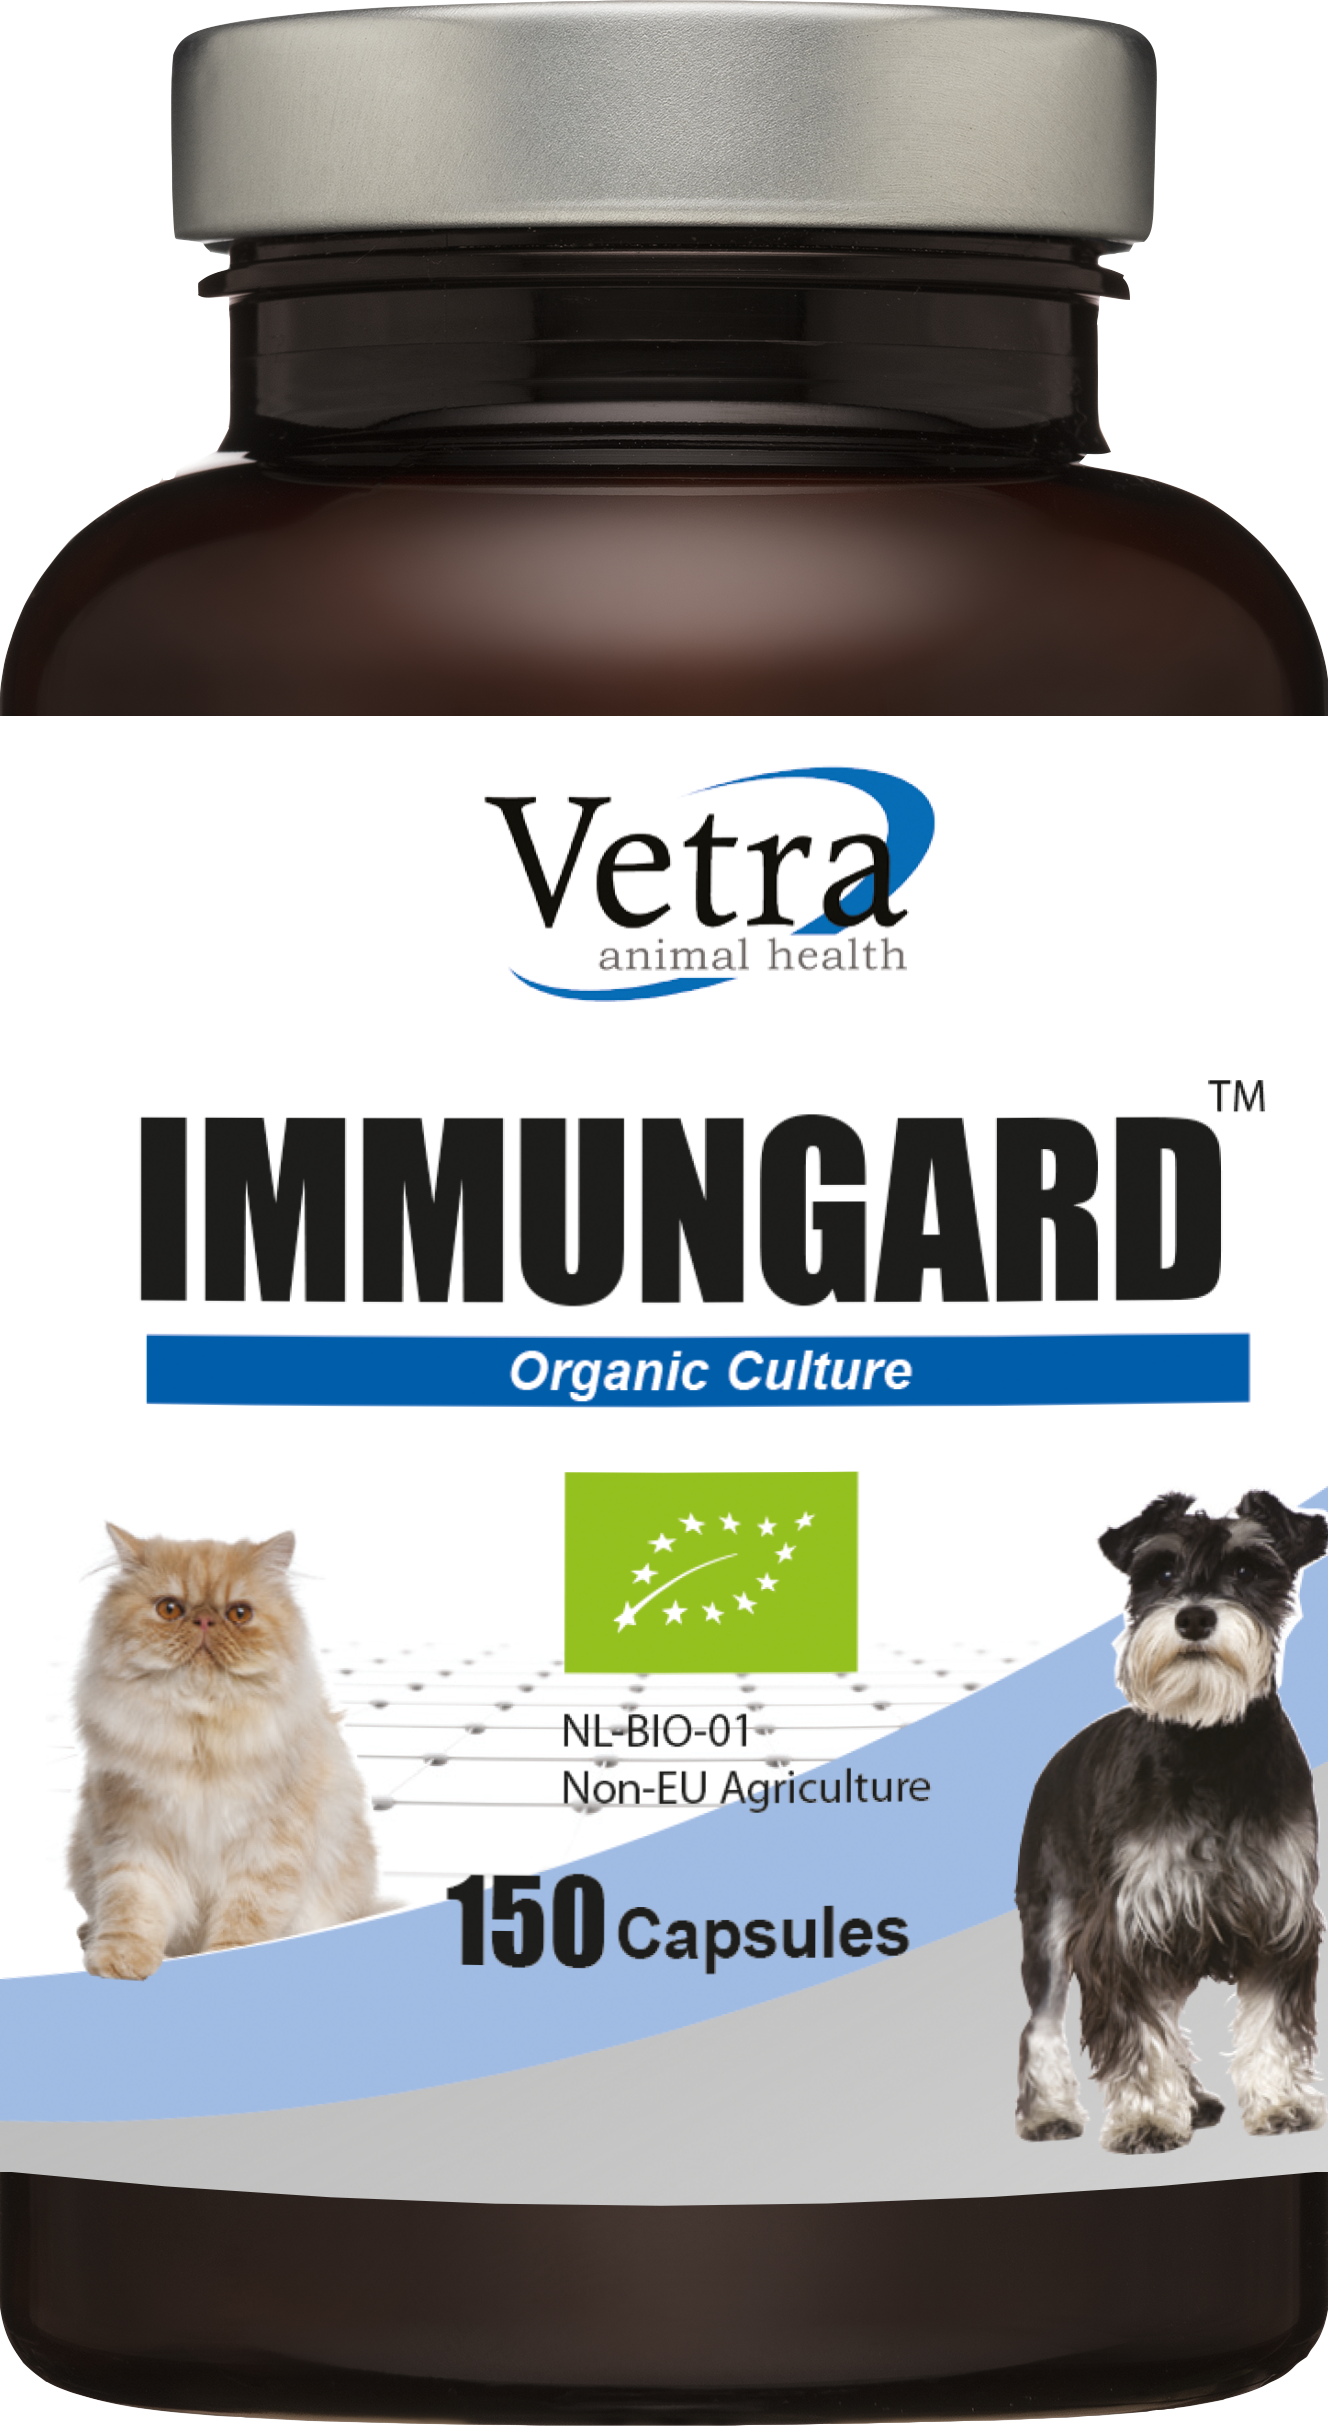 ImmunGard